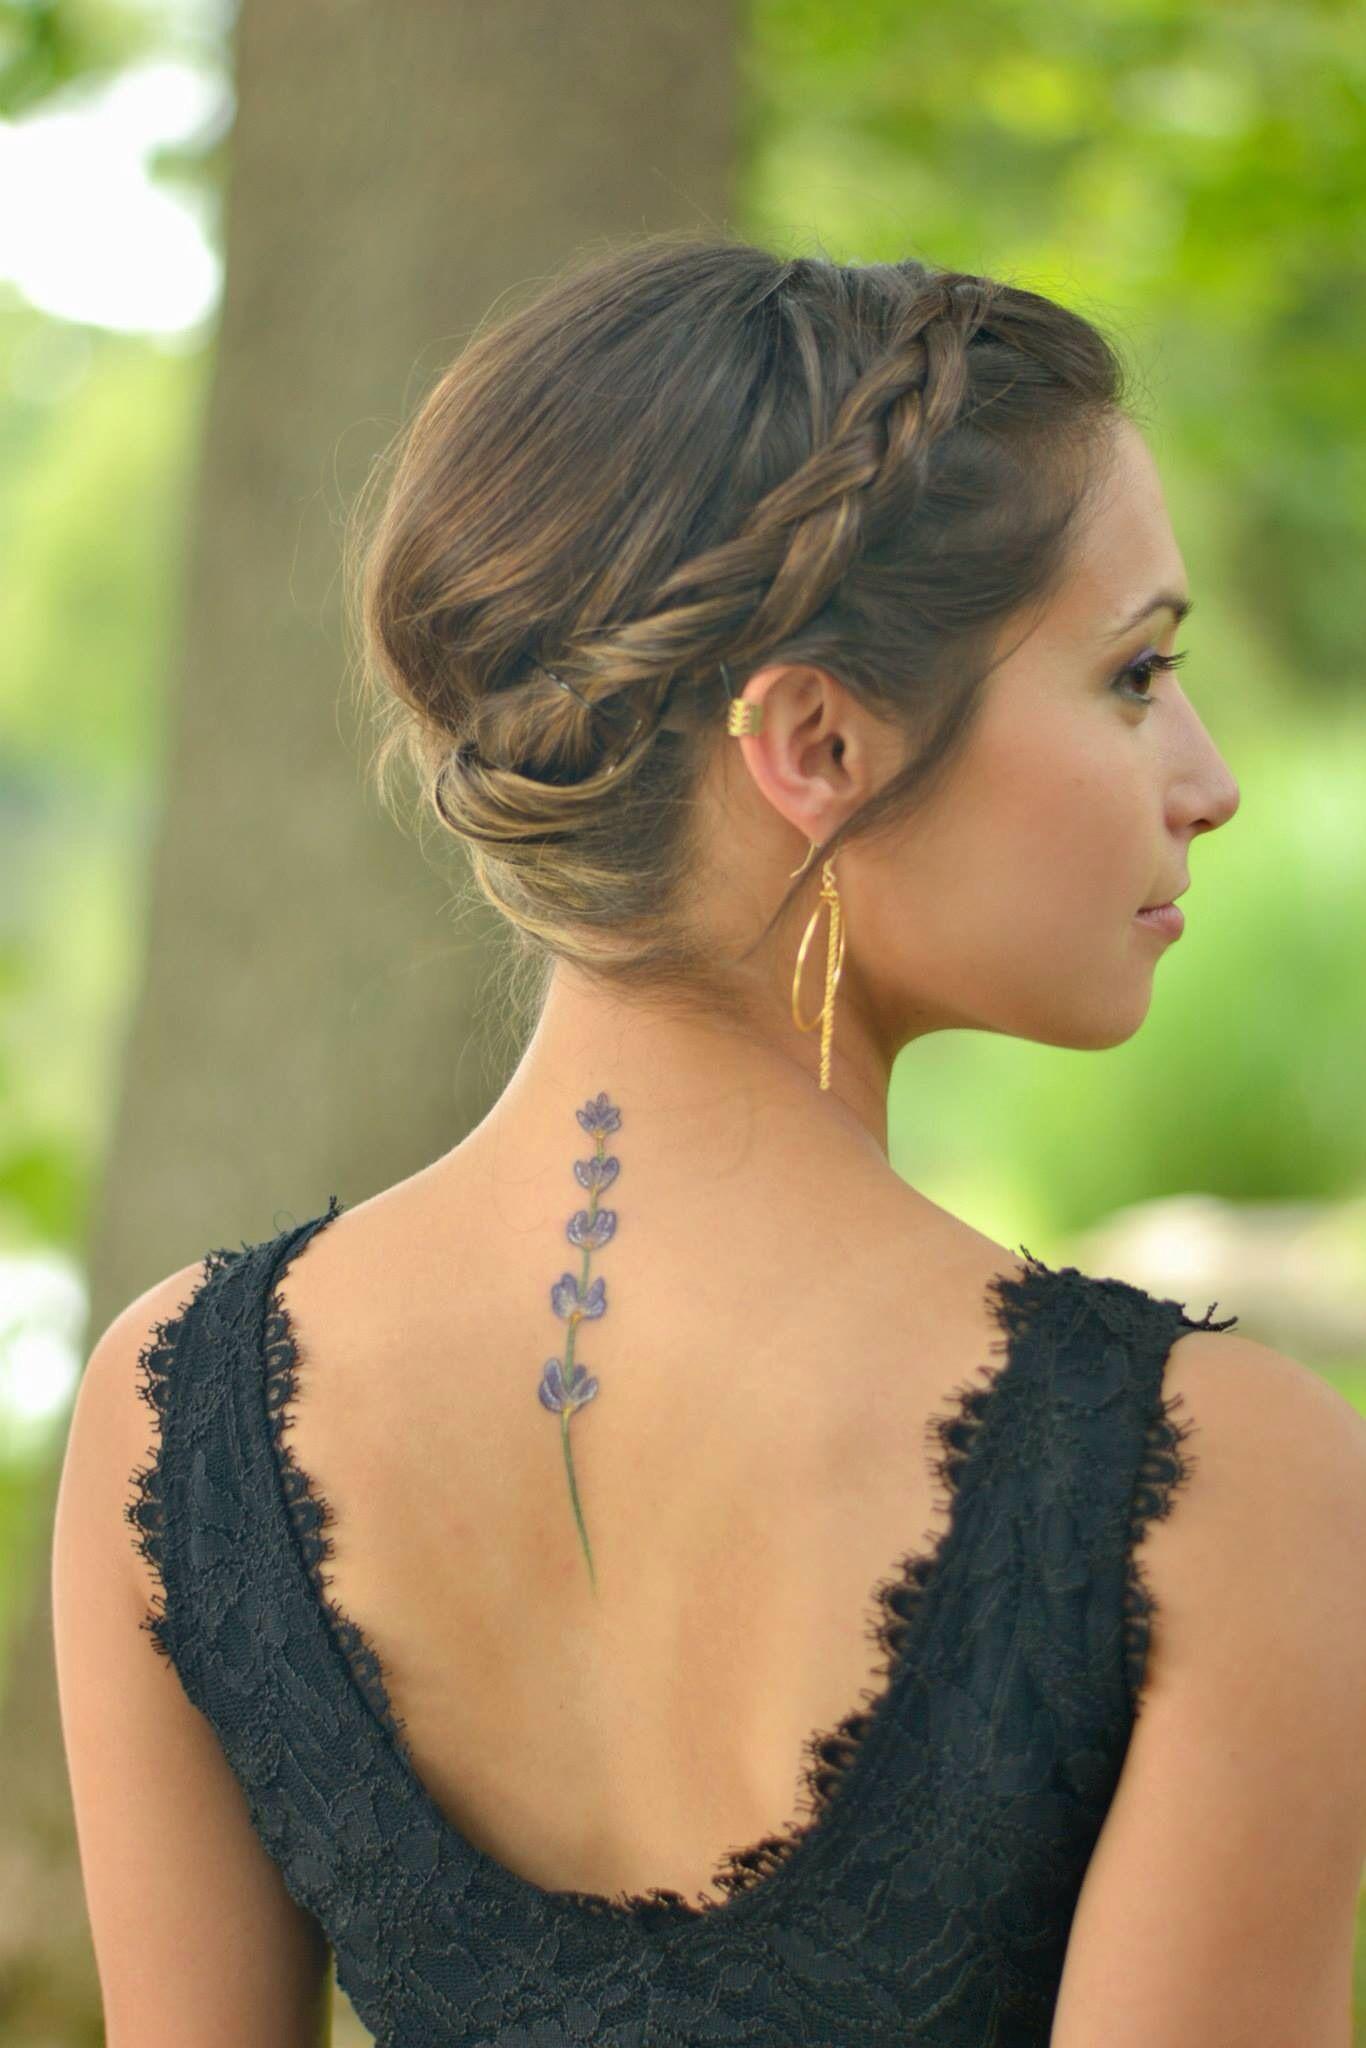 Lavender tattoo. Lavender tattoo, Classy tattoos, Spine